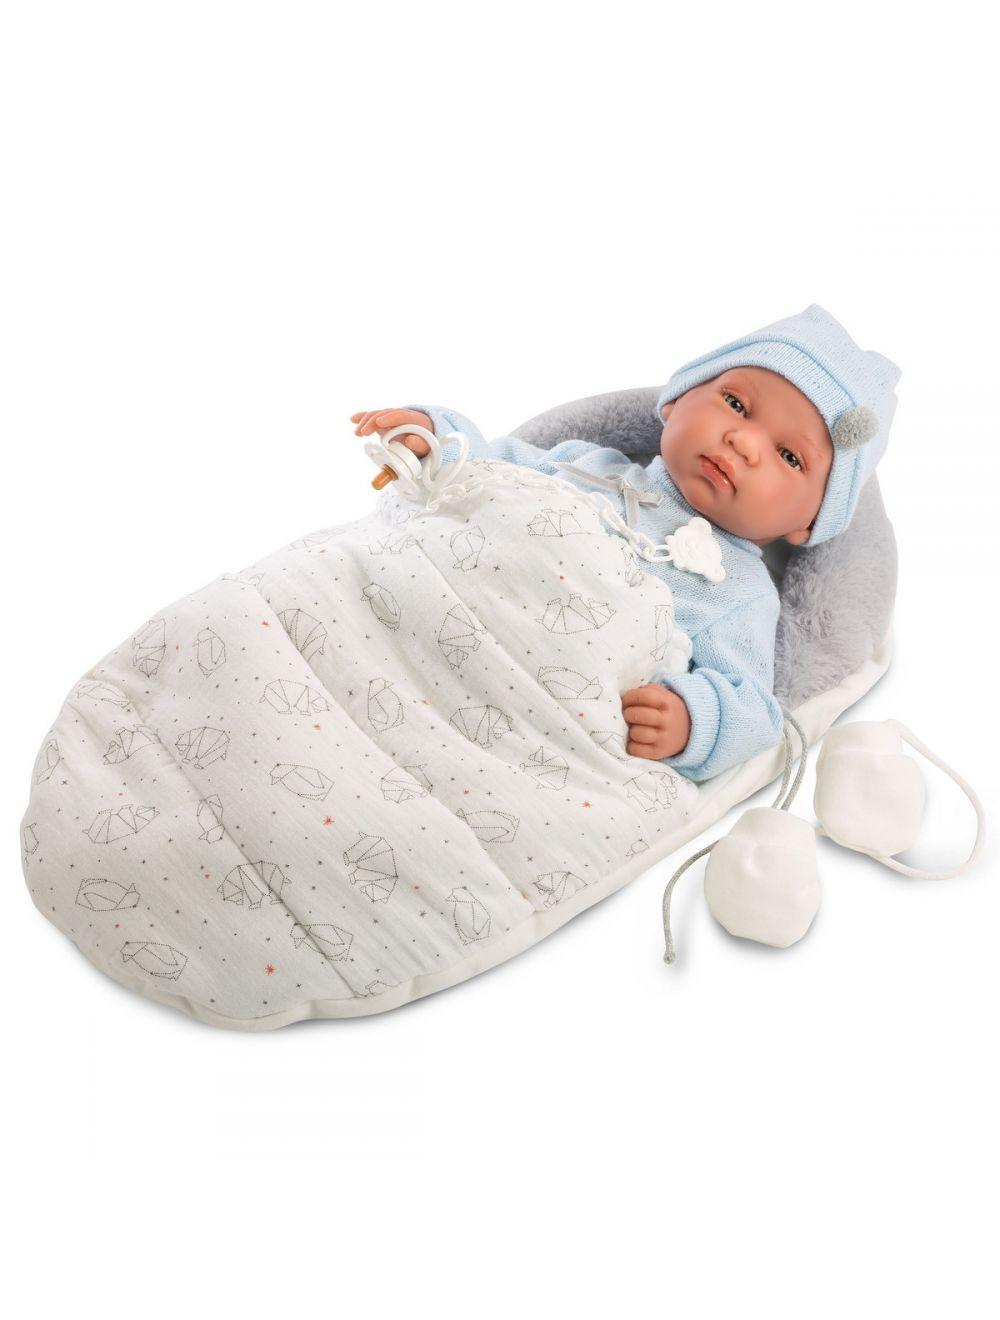 Llorens Bebo noworodek w beciku 44 cm